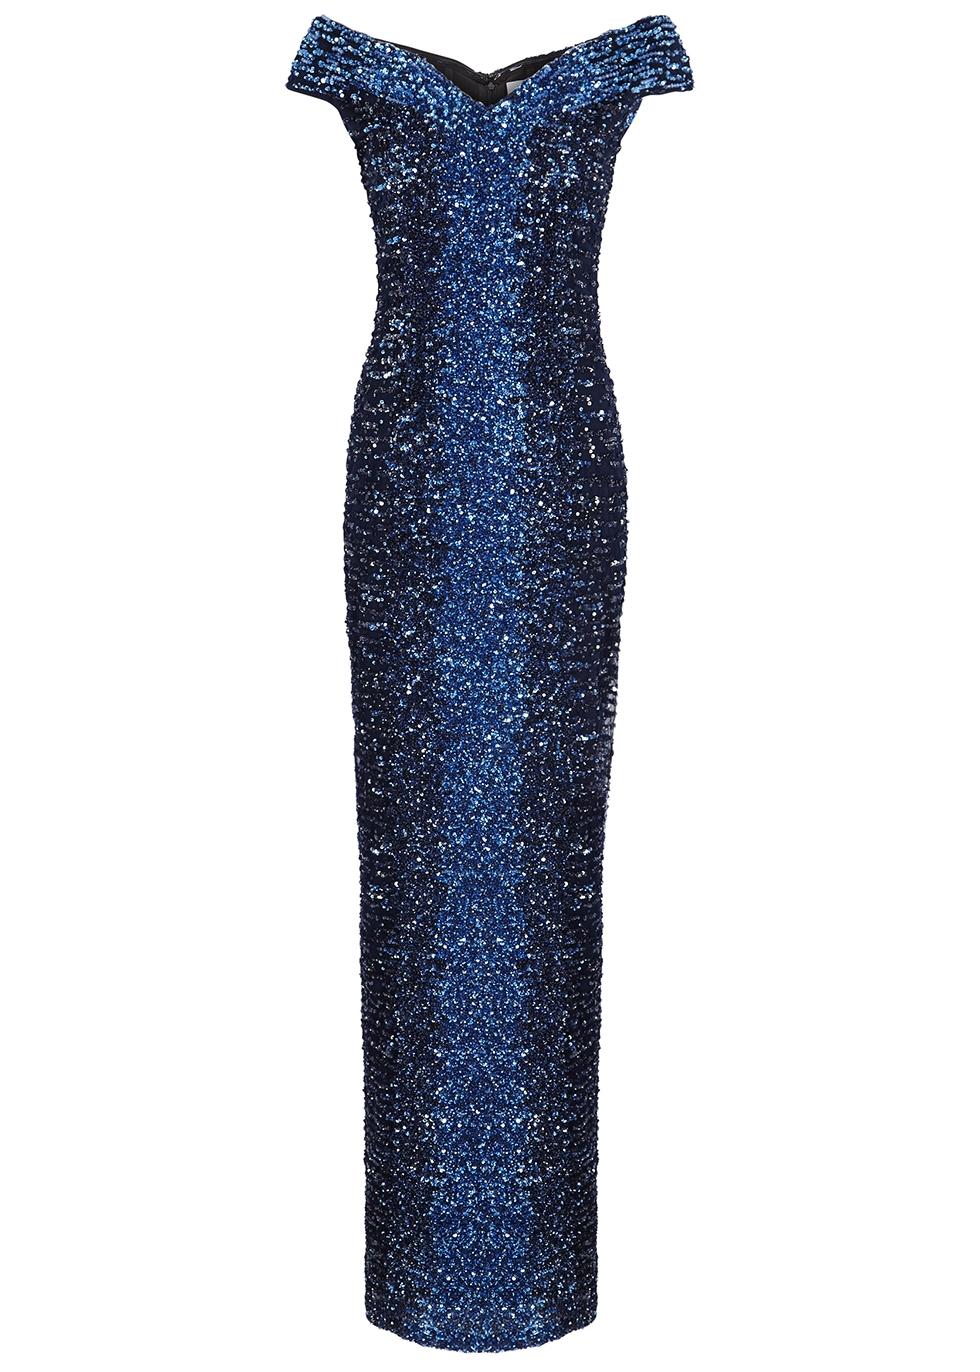 2e28775da52c Designer Gowns - Evening   Ball Gowns - Harvey Nichols